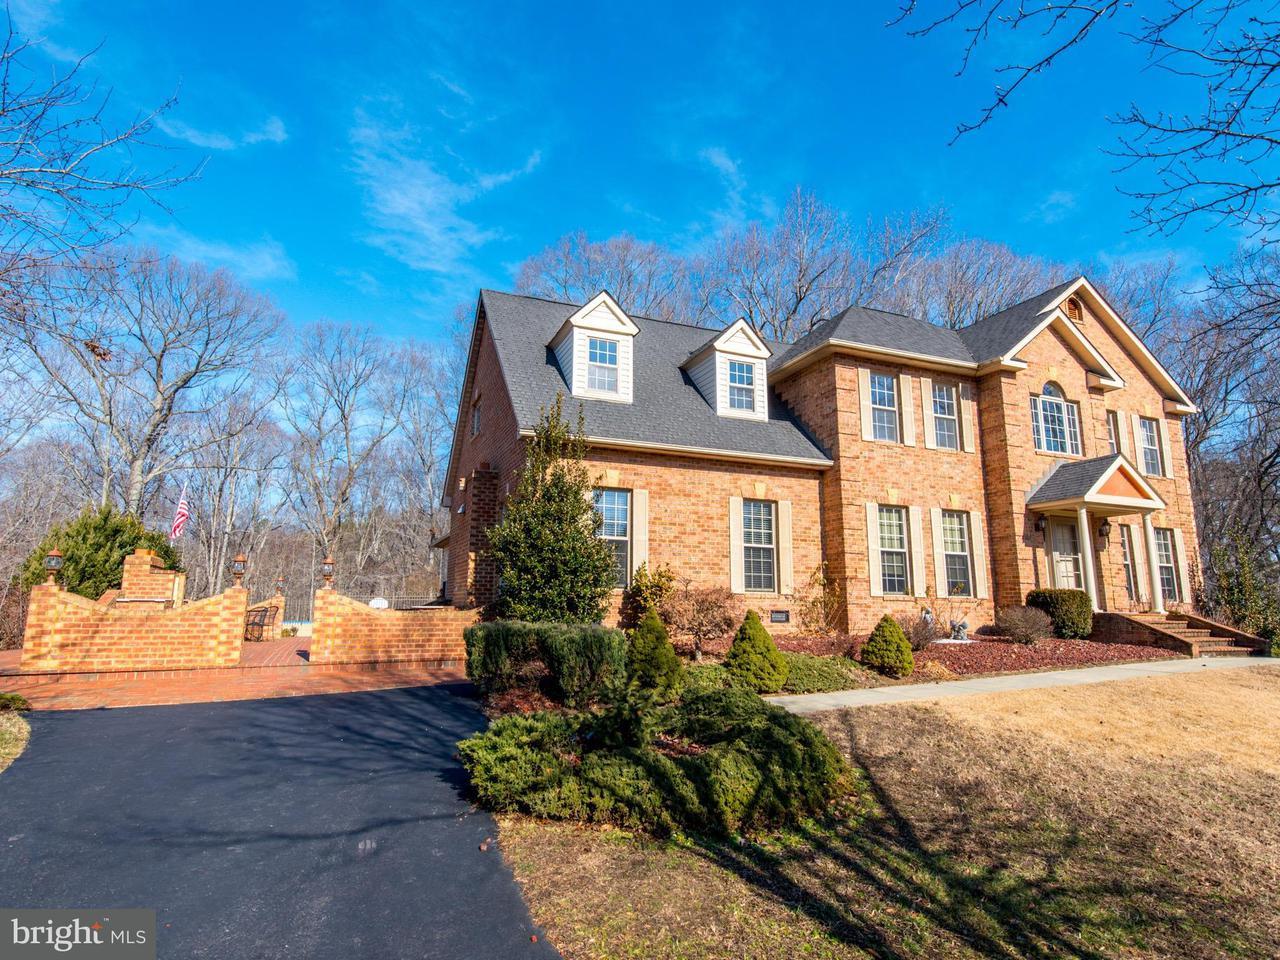 Casa Unifamiliar por un Venta en 16700 Swanson Cove Court 16700 Swanson Cove Court Hughesville, Maryland 20637 Estados Unidos